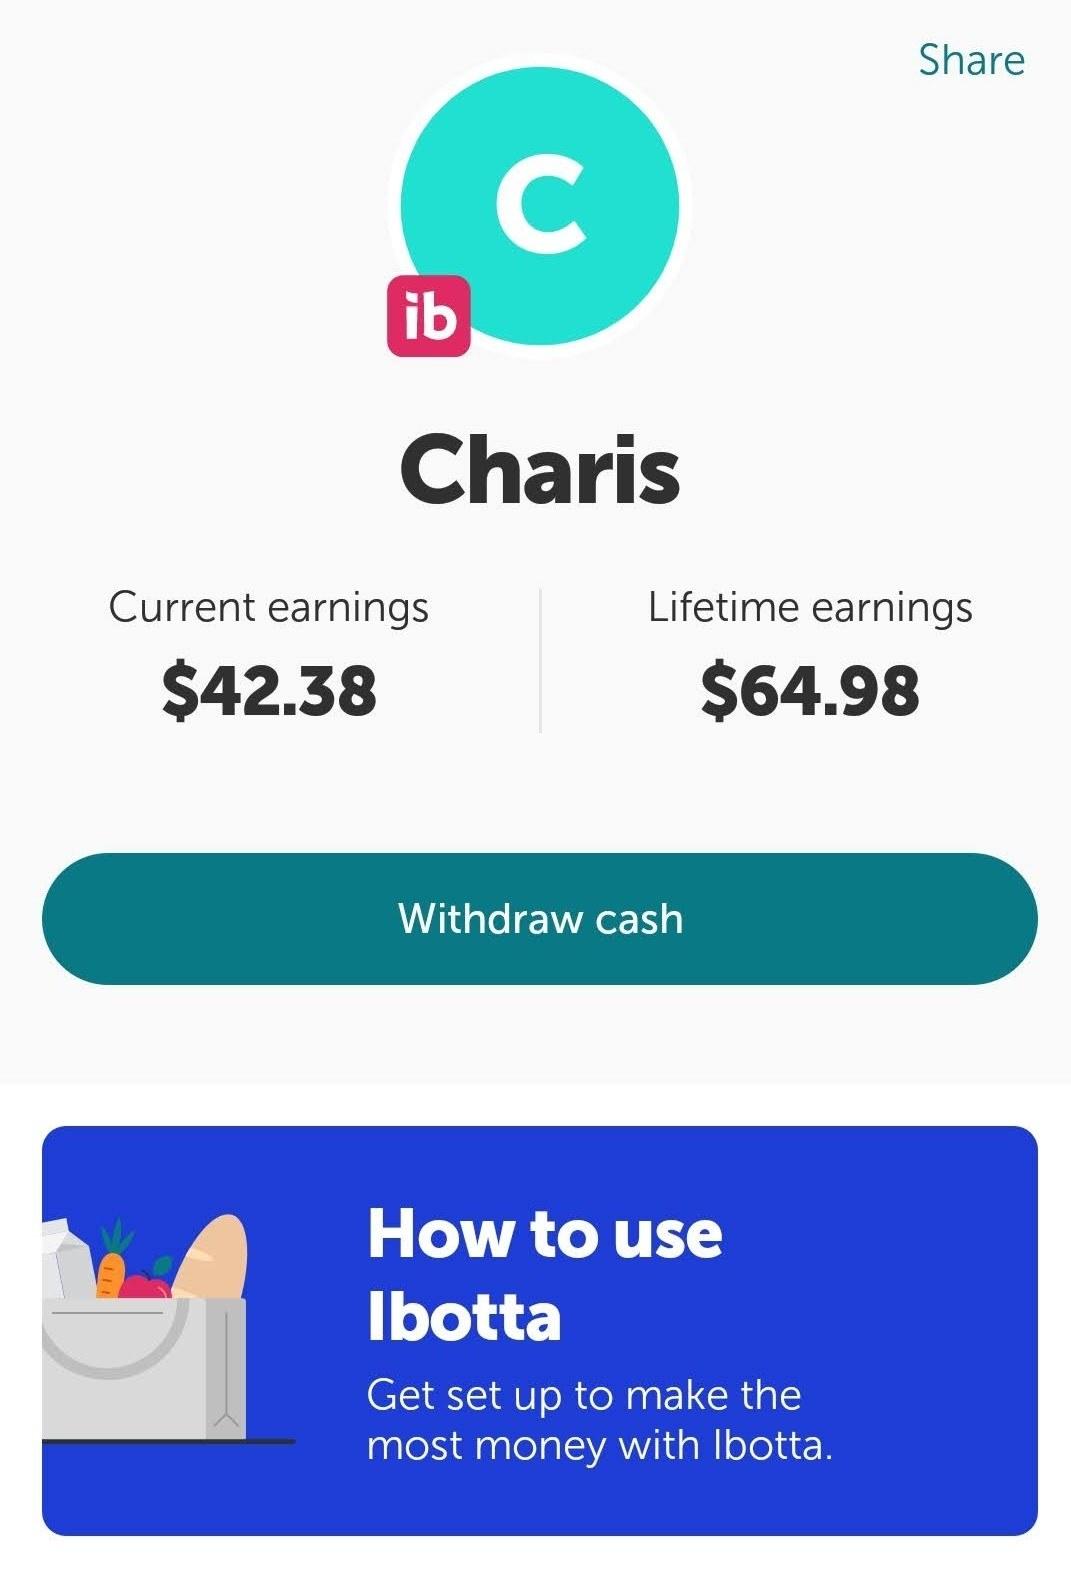 Screenshot of my savings on Ibotta; current earnings = $42.38